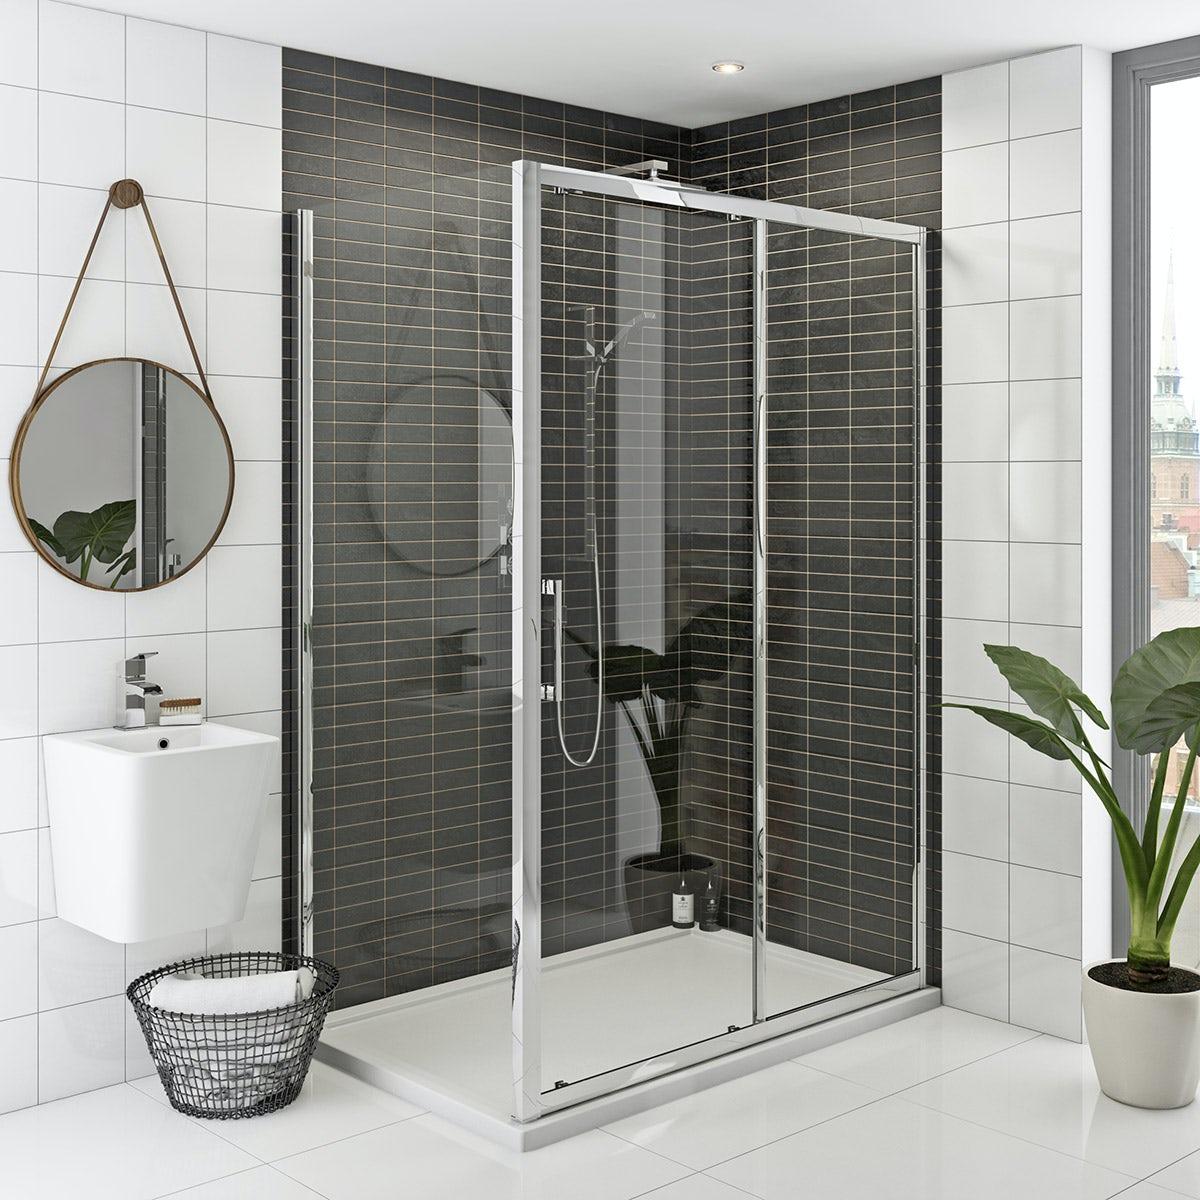 Rand Rectangular Shower Enclosure 1000 x 700mm - Easy Clean - 8mm